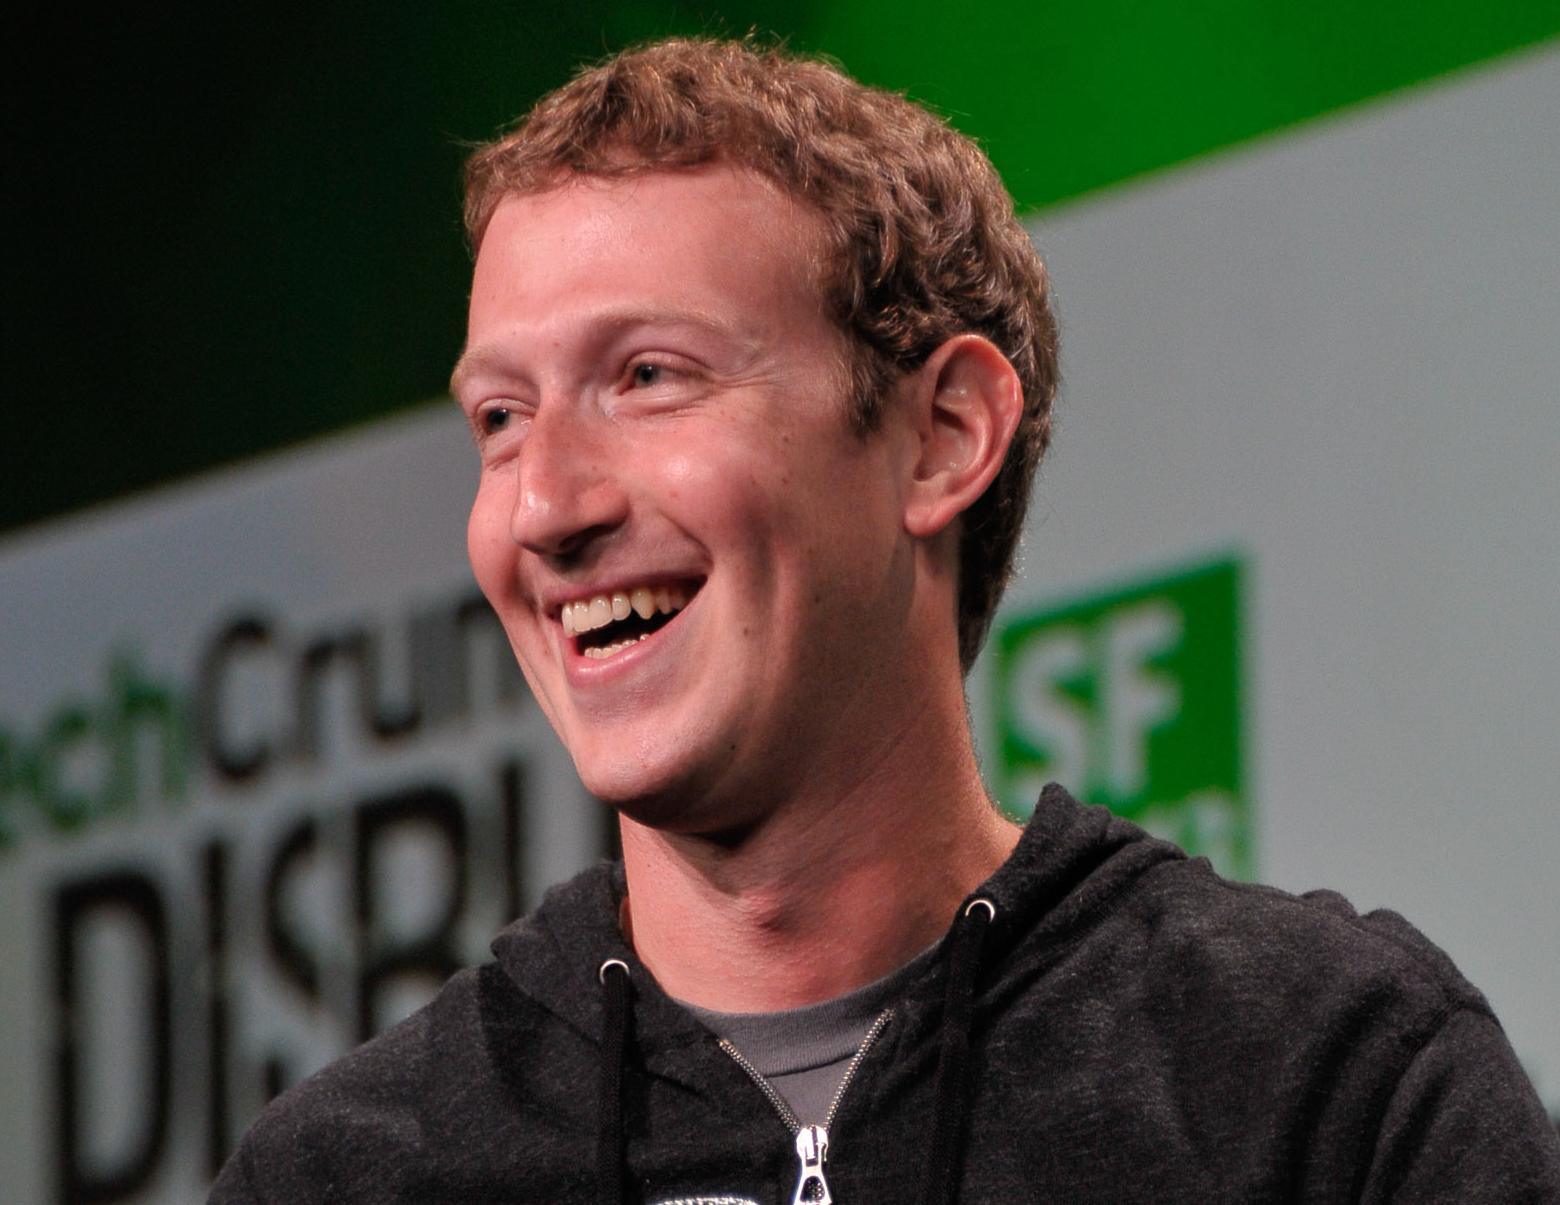 Mark Zuckerberg reveals AI voiced by Morgan Freeman